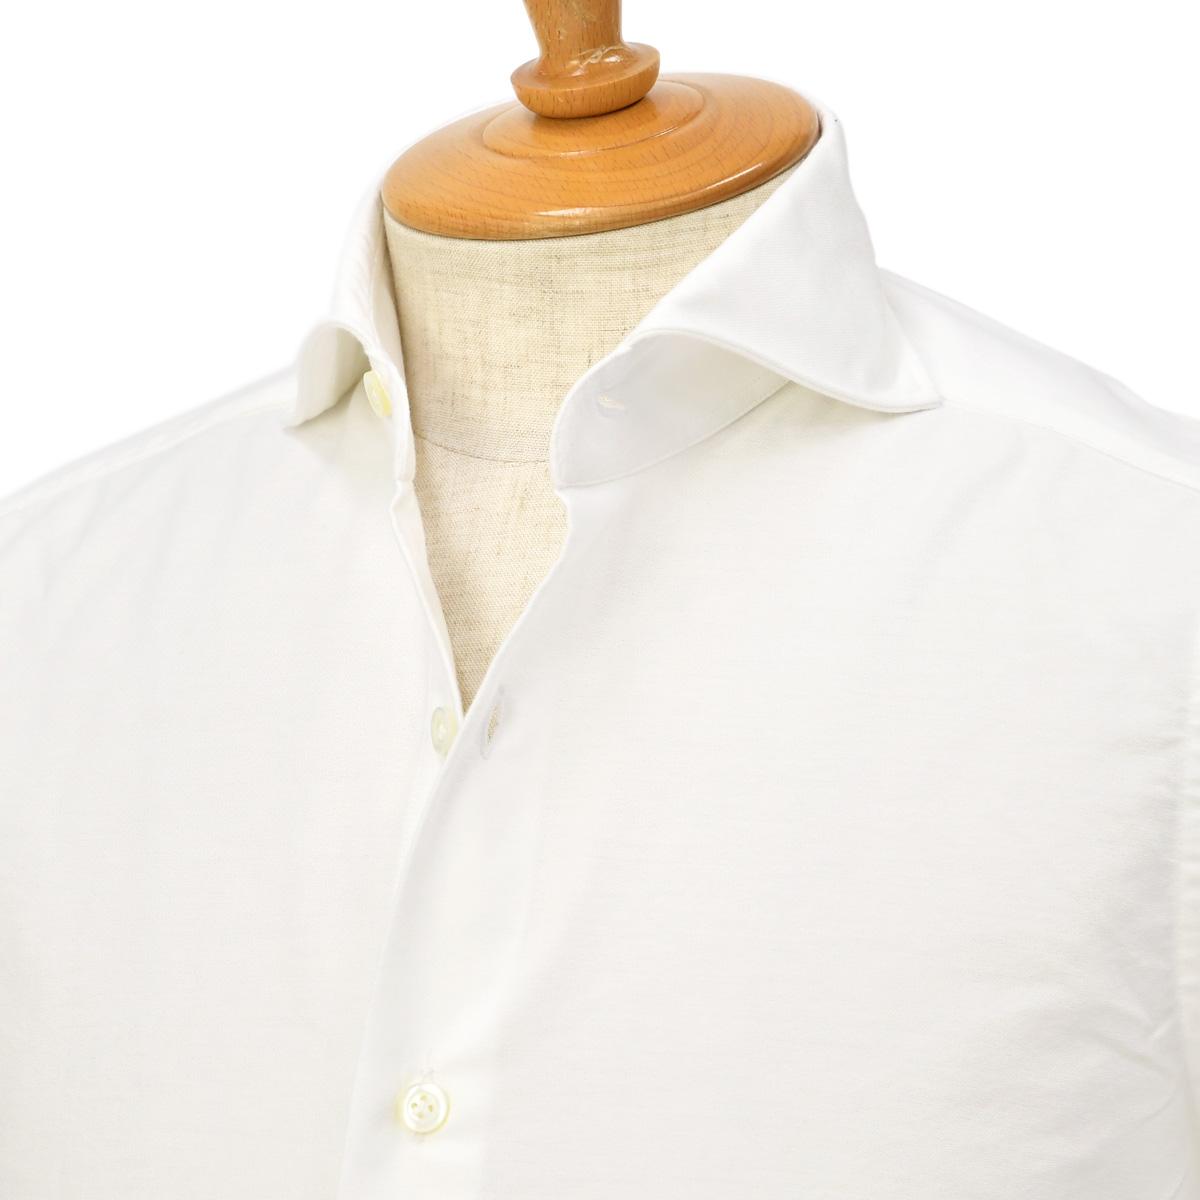 【30%OFF】【size36,37,43】Giannetto【ジャンネット】オックスフォードシャツ SLIMFIT WE14600L84 001 コットン ホワイト